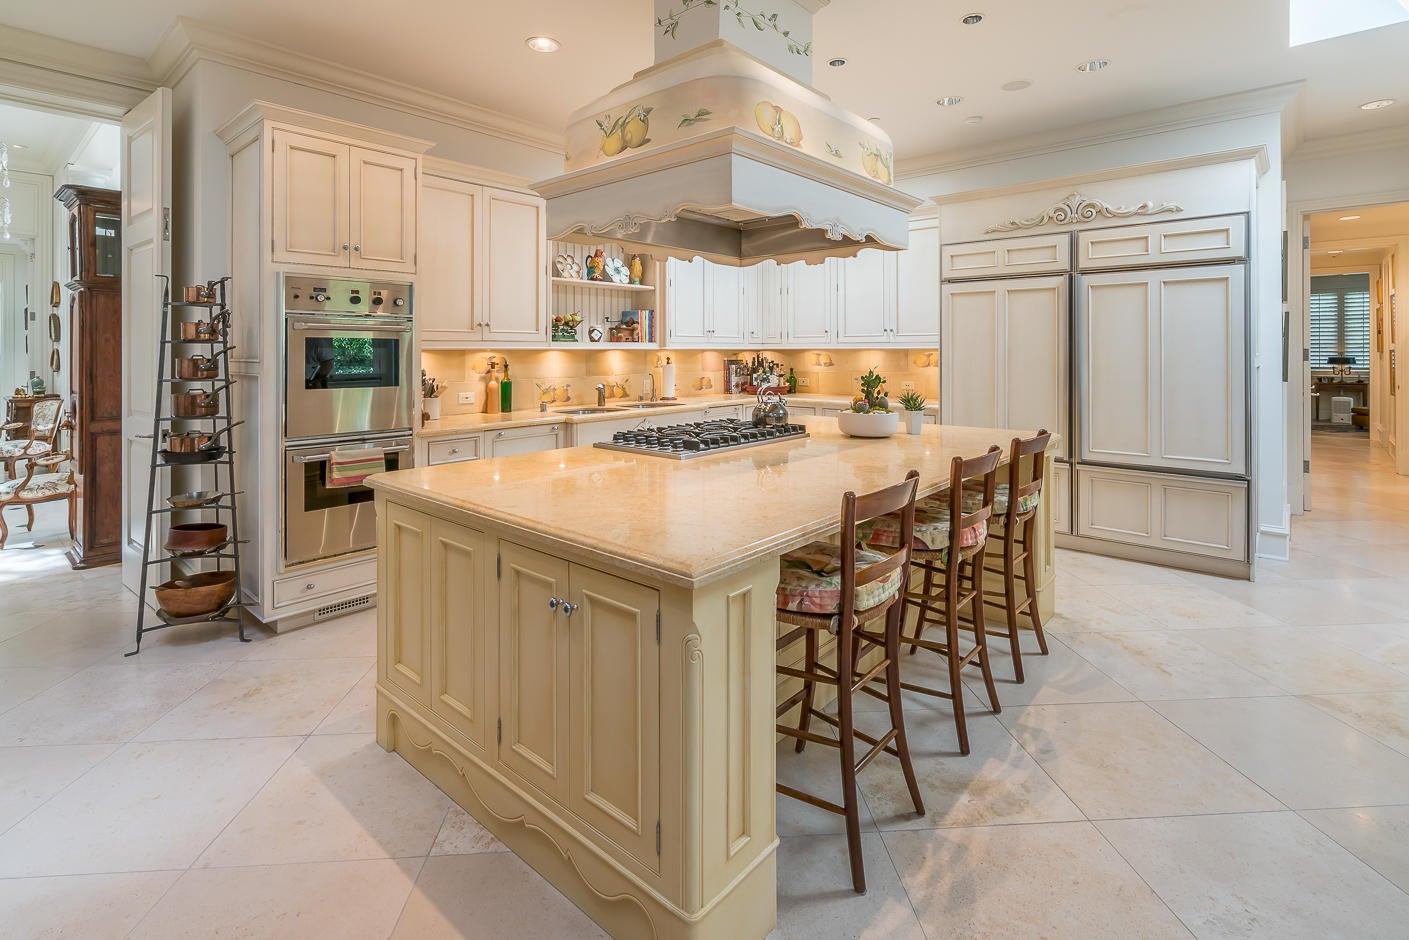 8 San Leandro kitchen